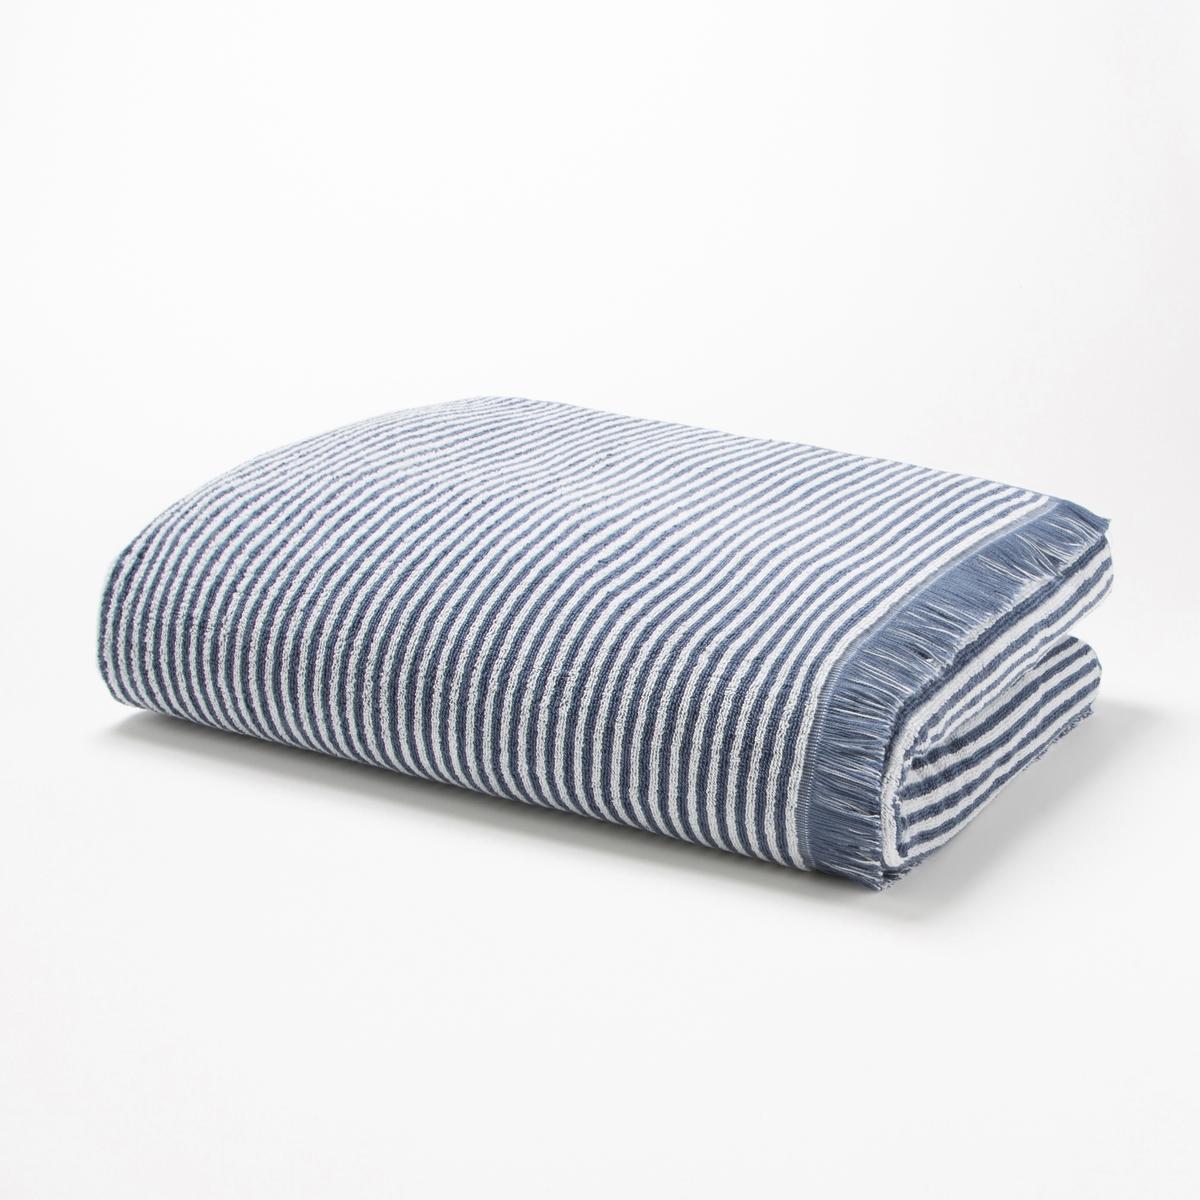 Полотенце La Redoute Банное в полоску из махровой ткани HARMONY 70 x 140 см синий